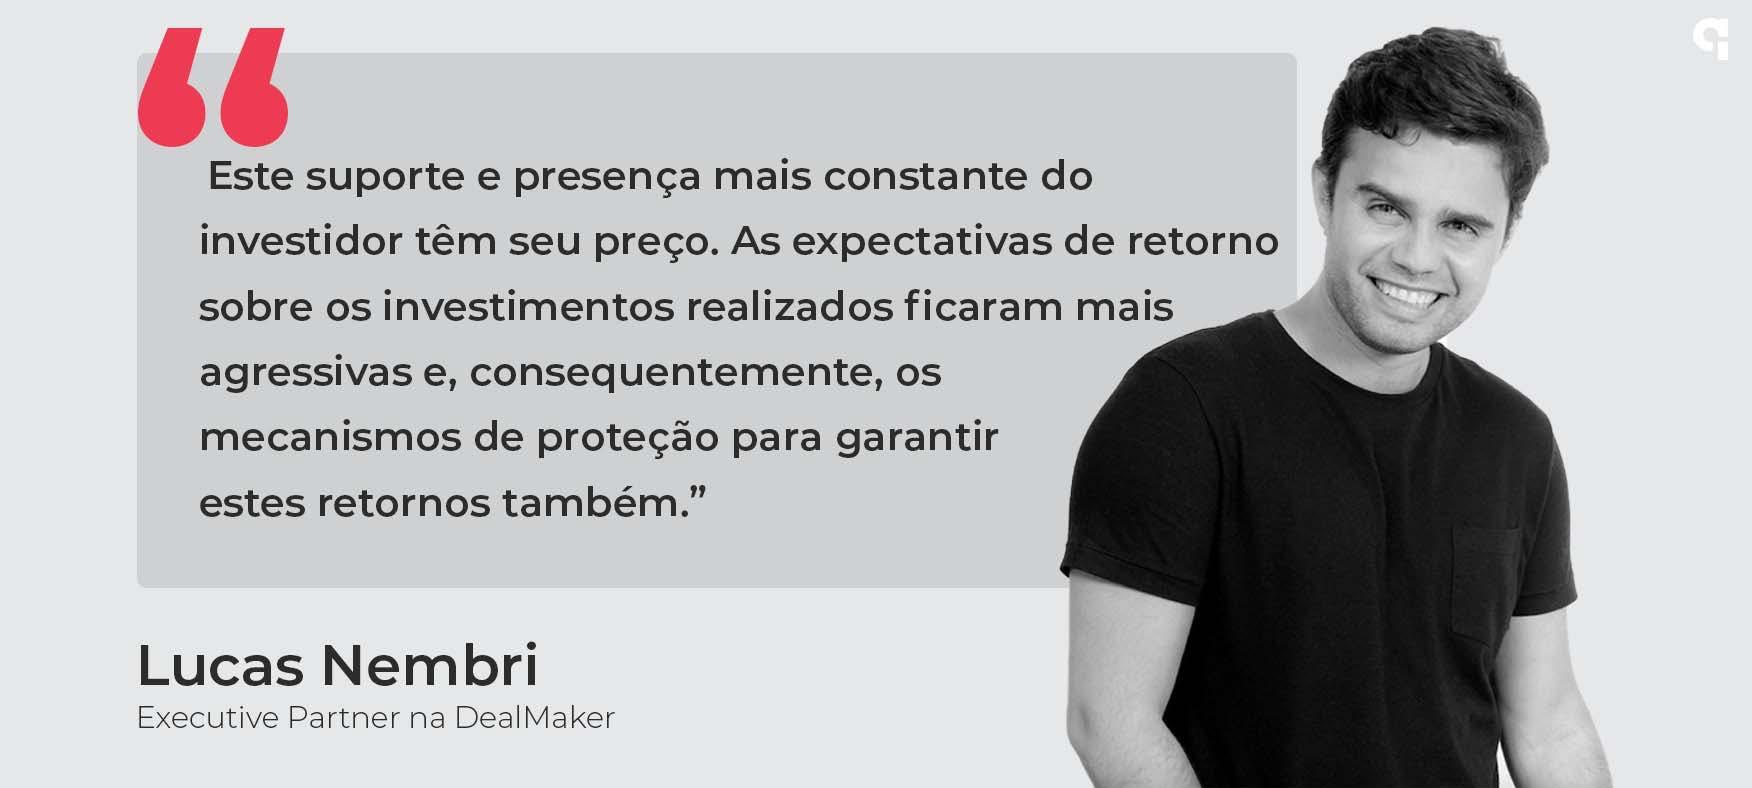 Lucas Nembri, executivo da dealmaker fala sobre investimentos no Brasil